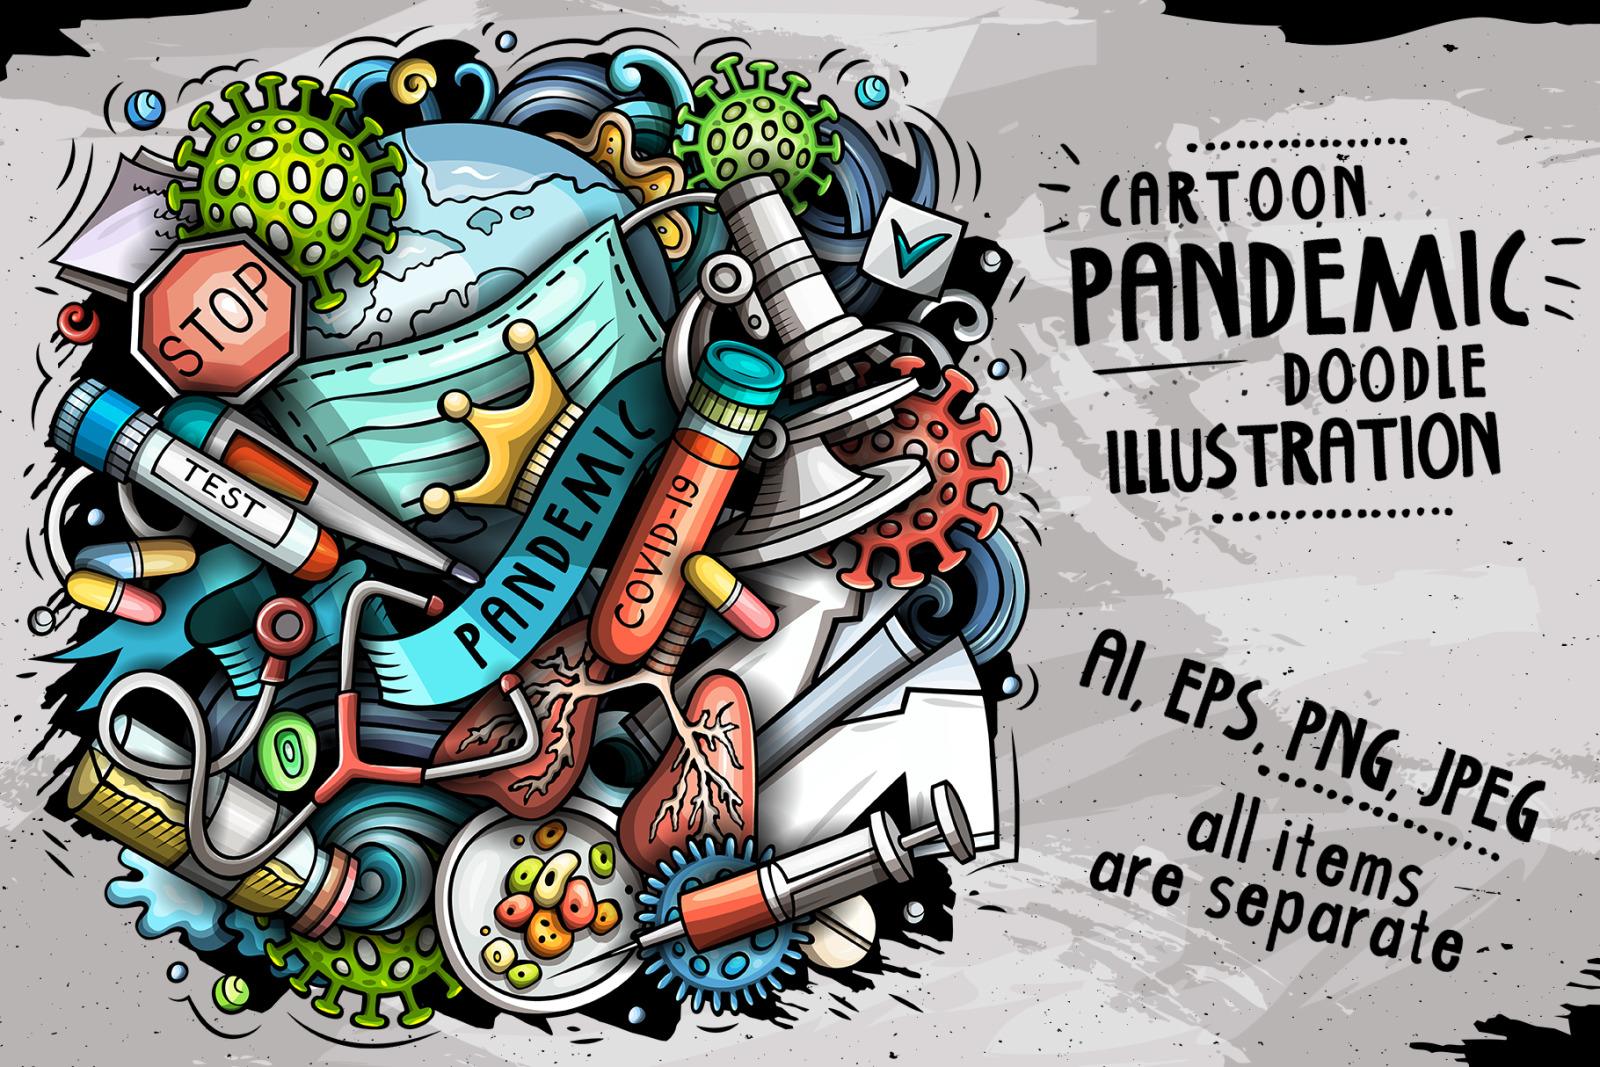 Cartoon vector doodles Pandemic illustration